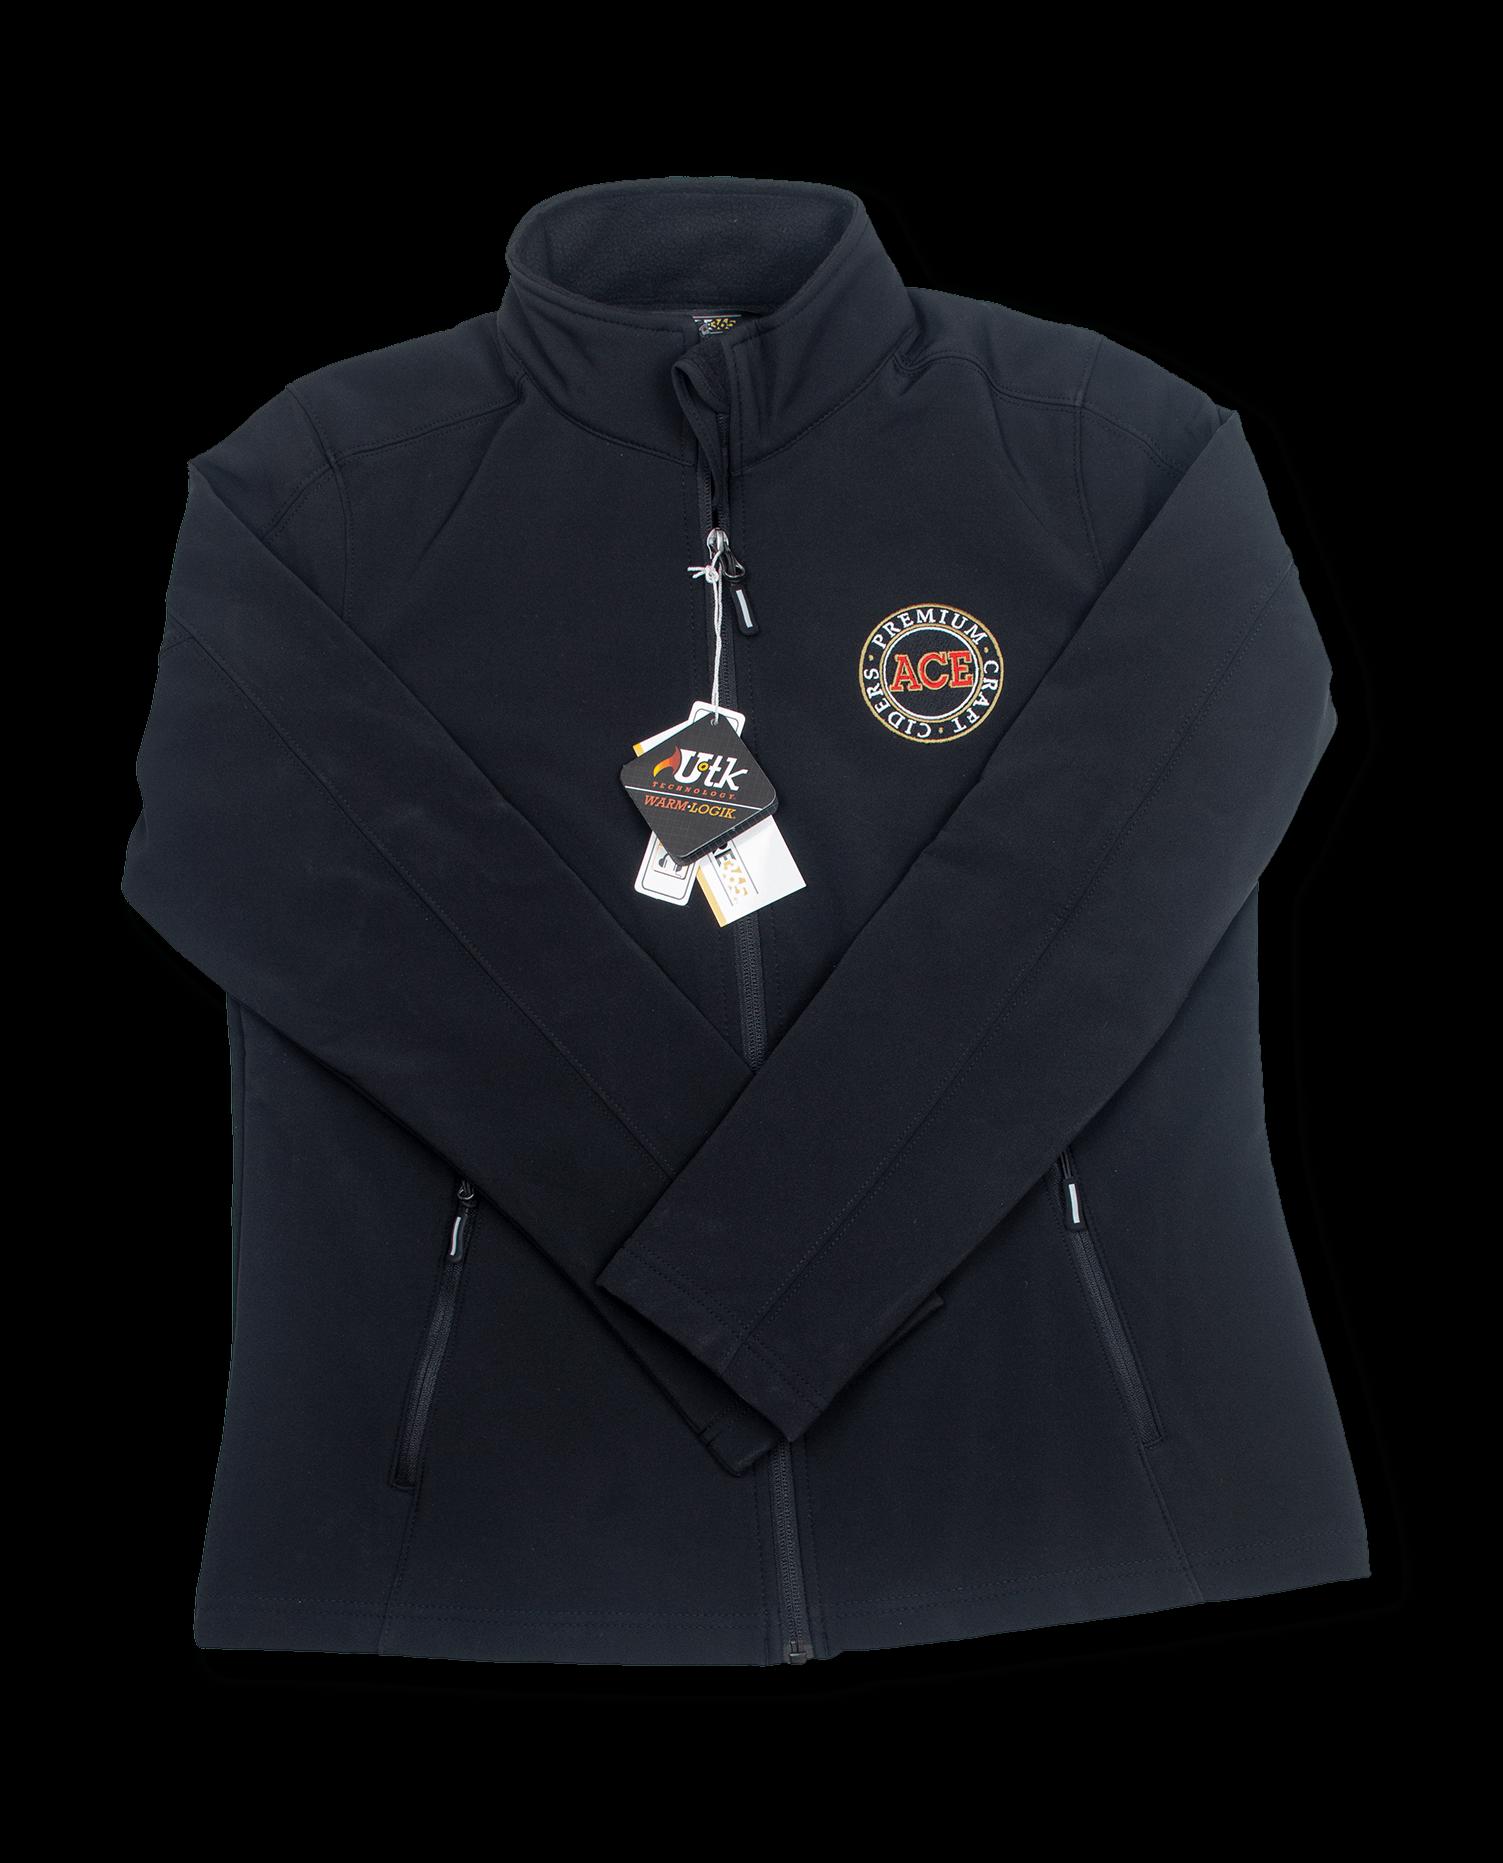 Ace Cider Women's Jacket